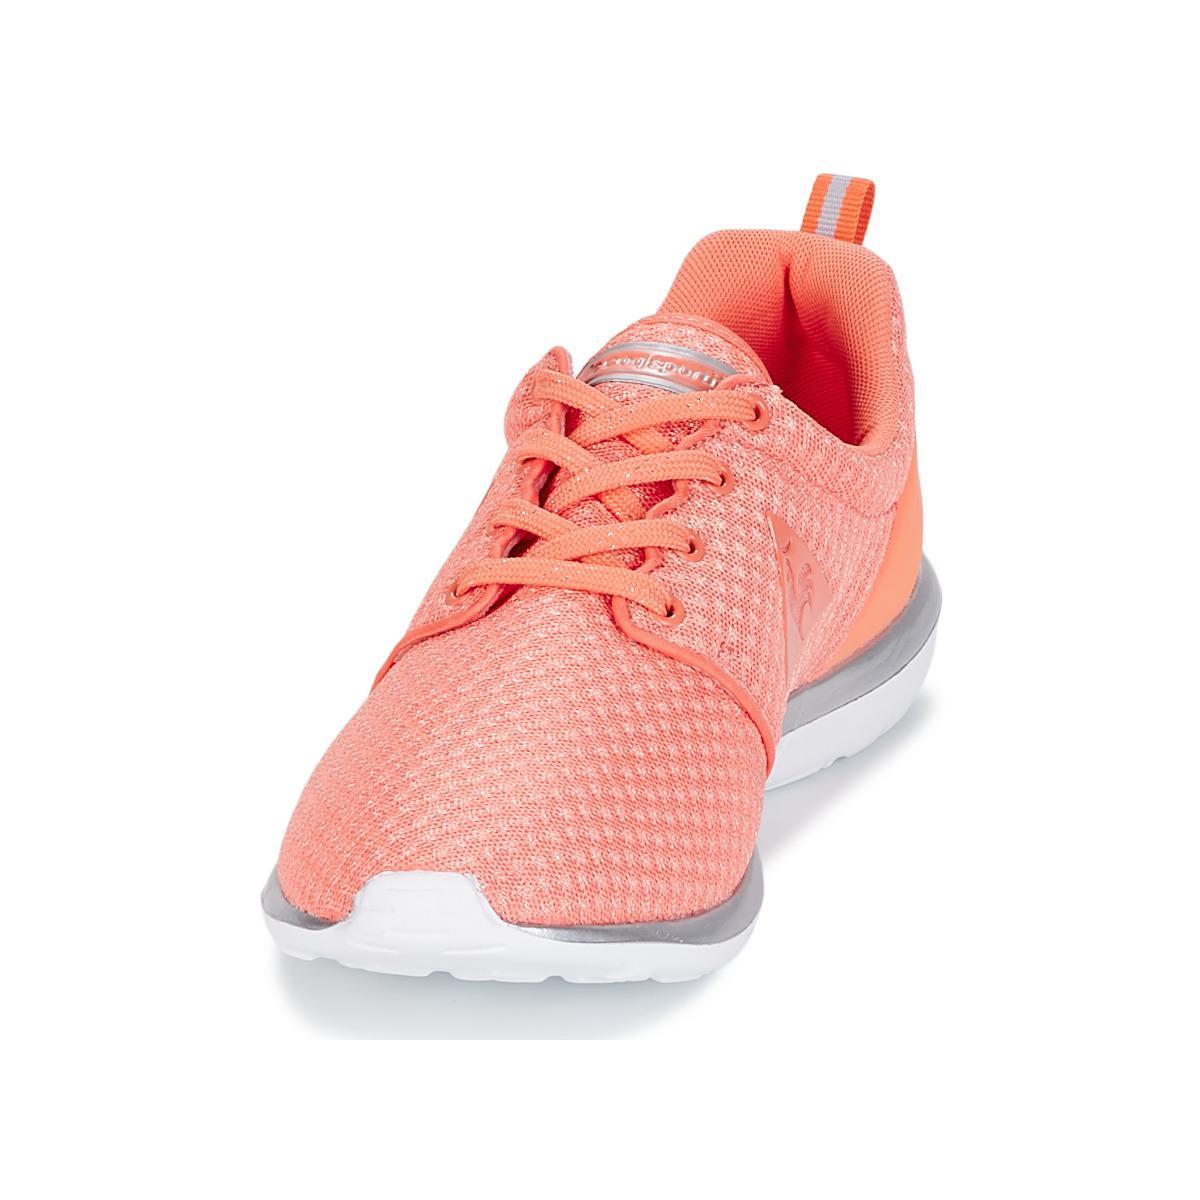 3936858d098c Le Coq Sportif - Dynacomf W Feminine Mesh metallic Women s Shoes (trainers)  In. View fullscreen